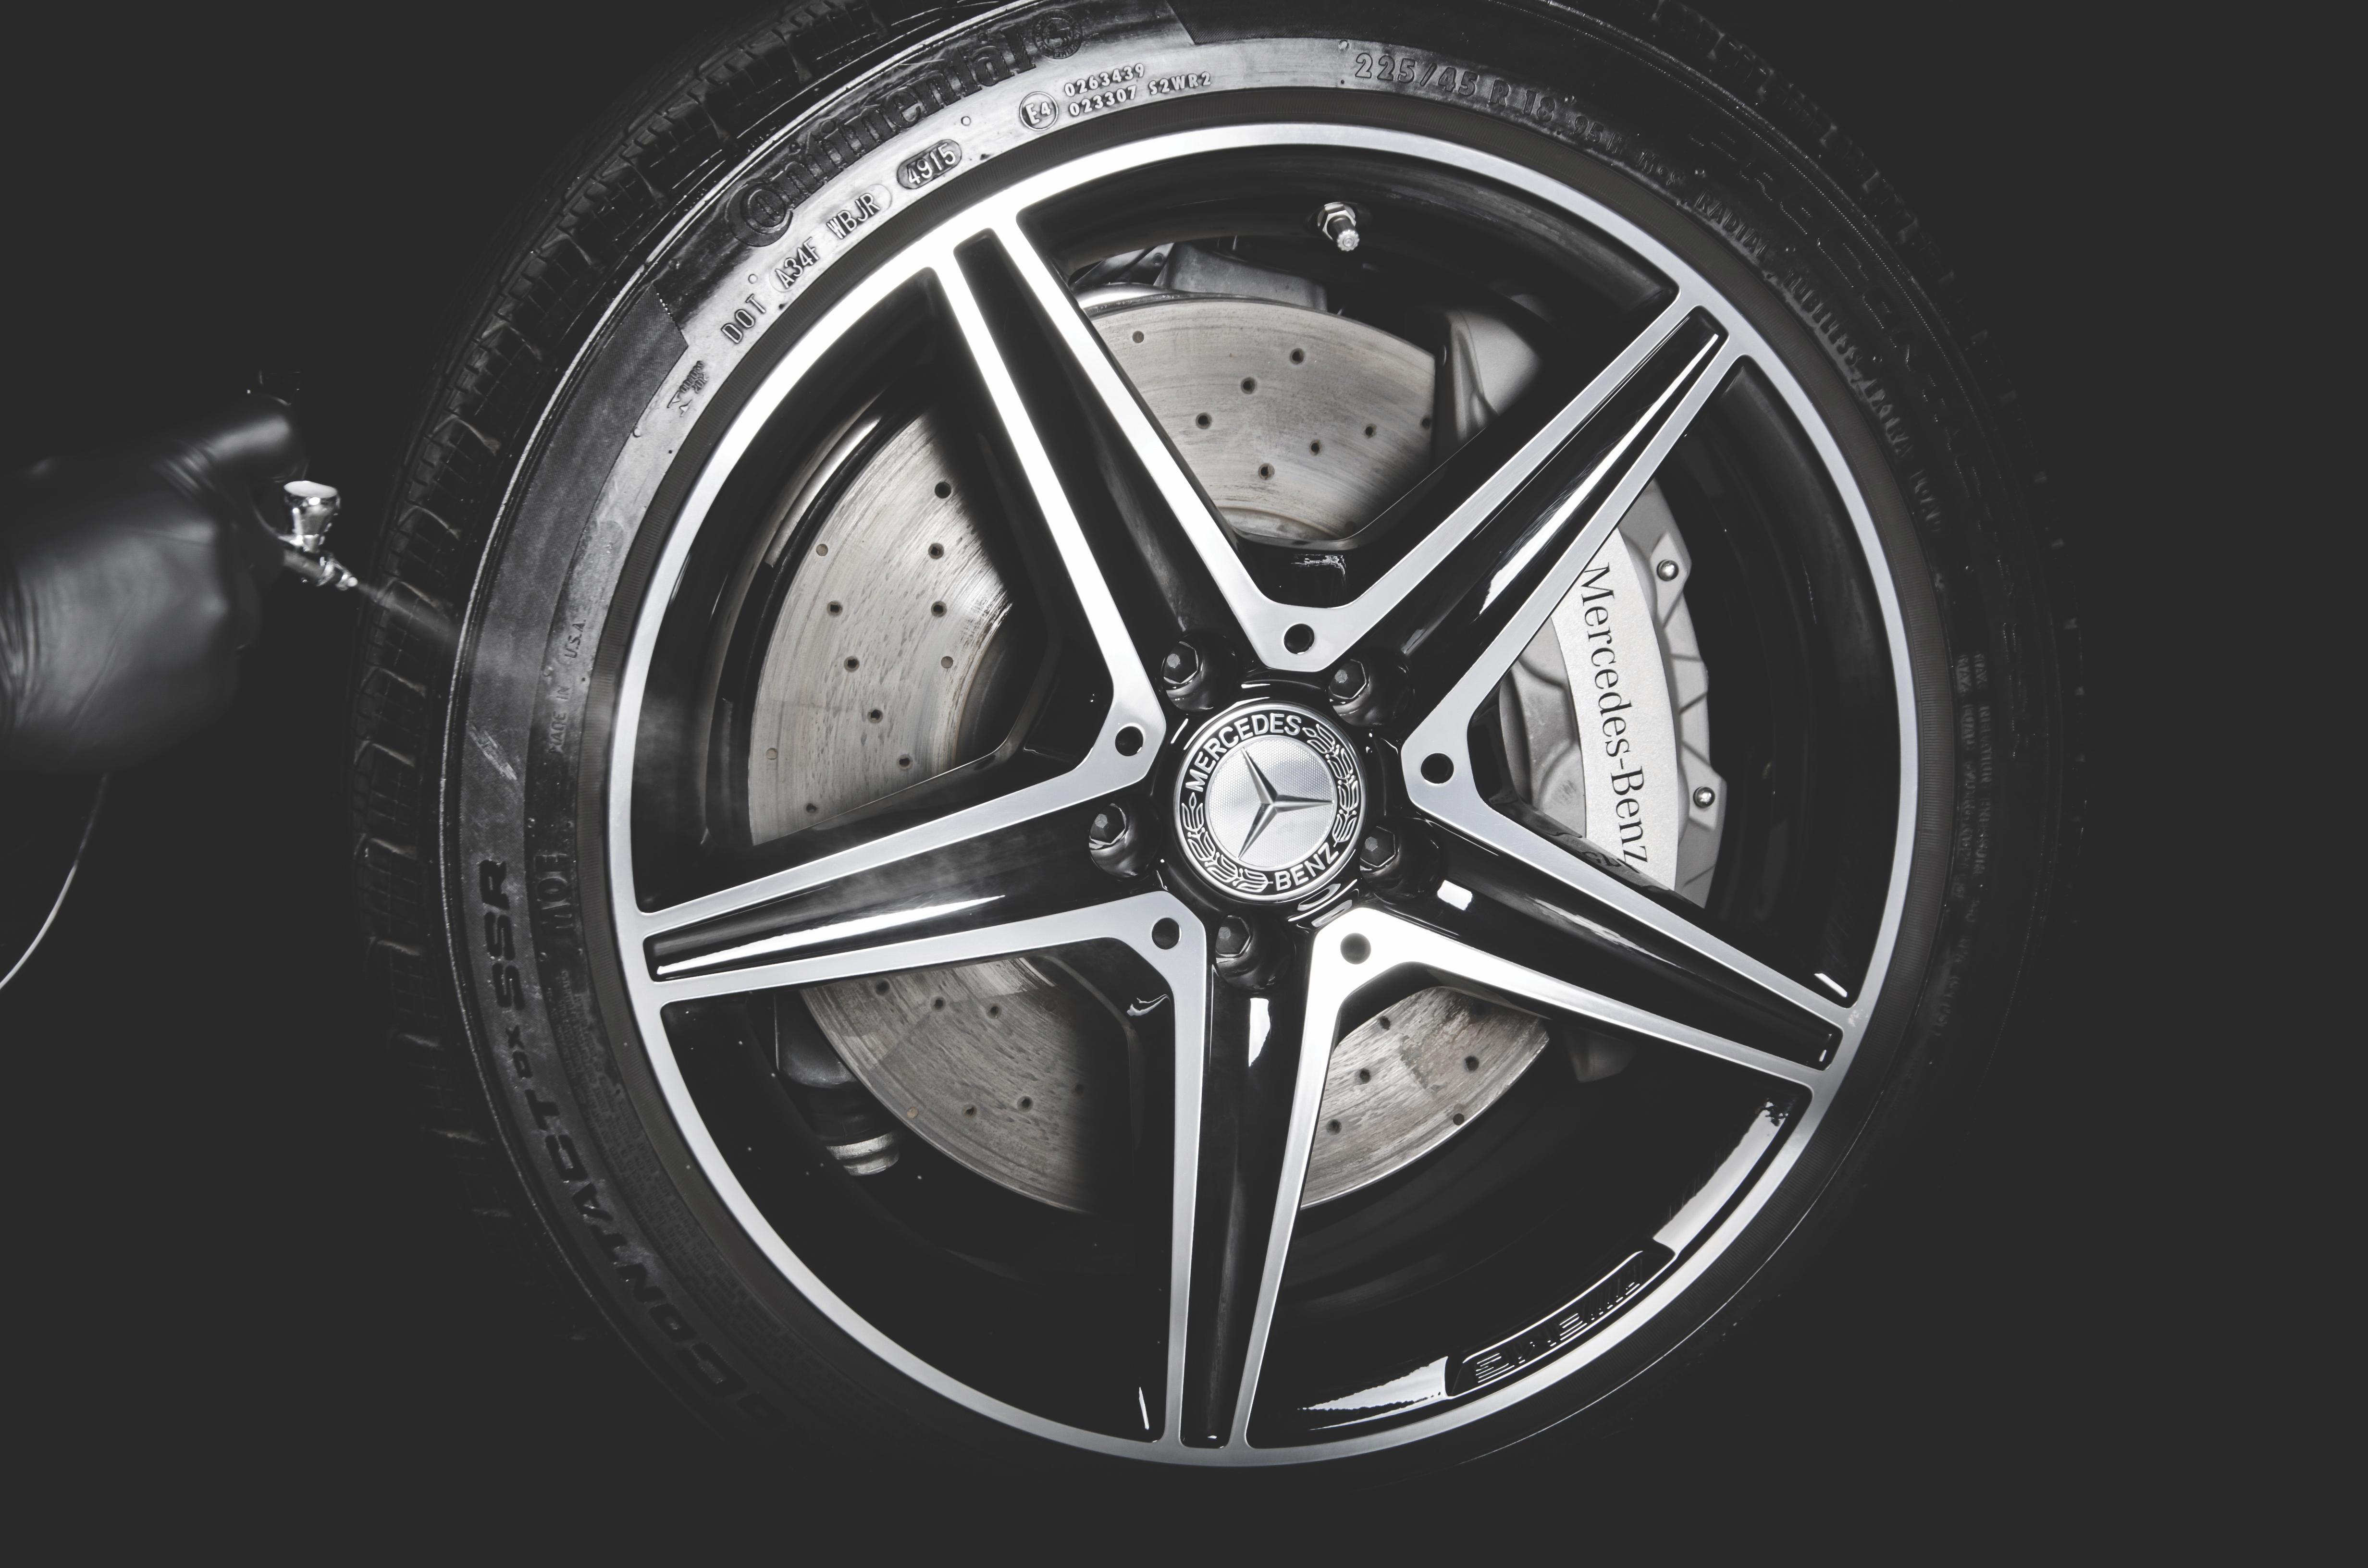 Protection with Ceramic Pro Wheel&Caliper: